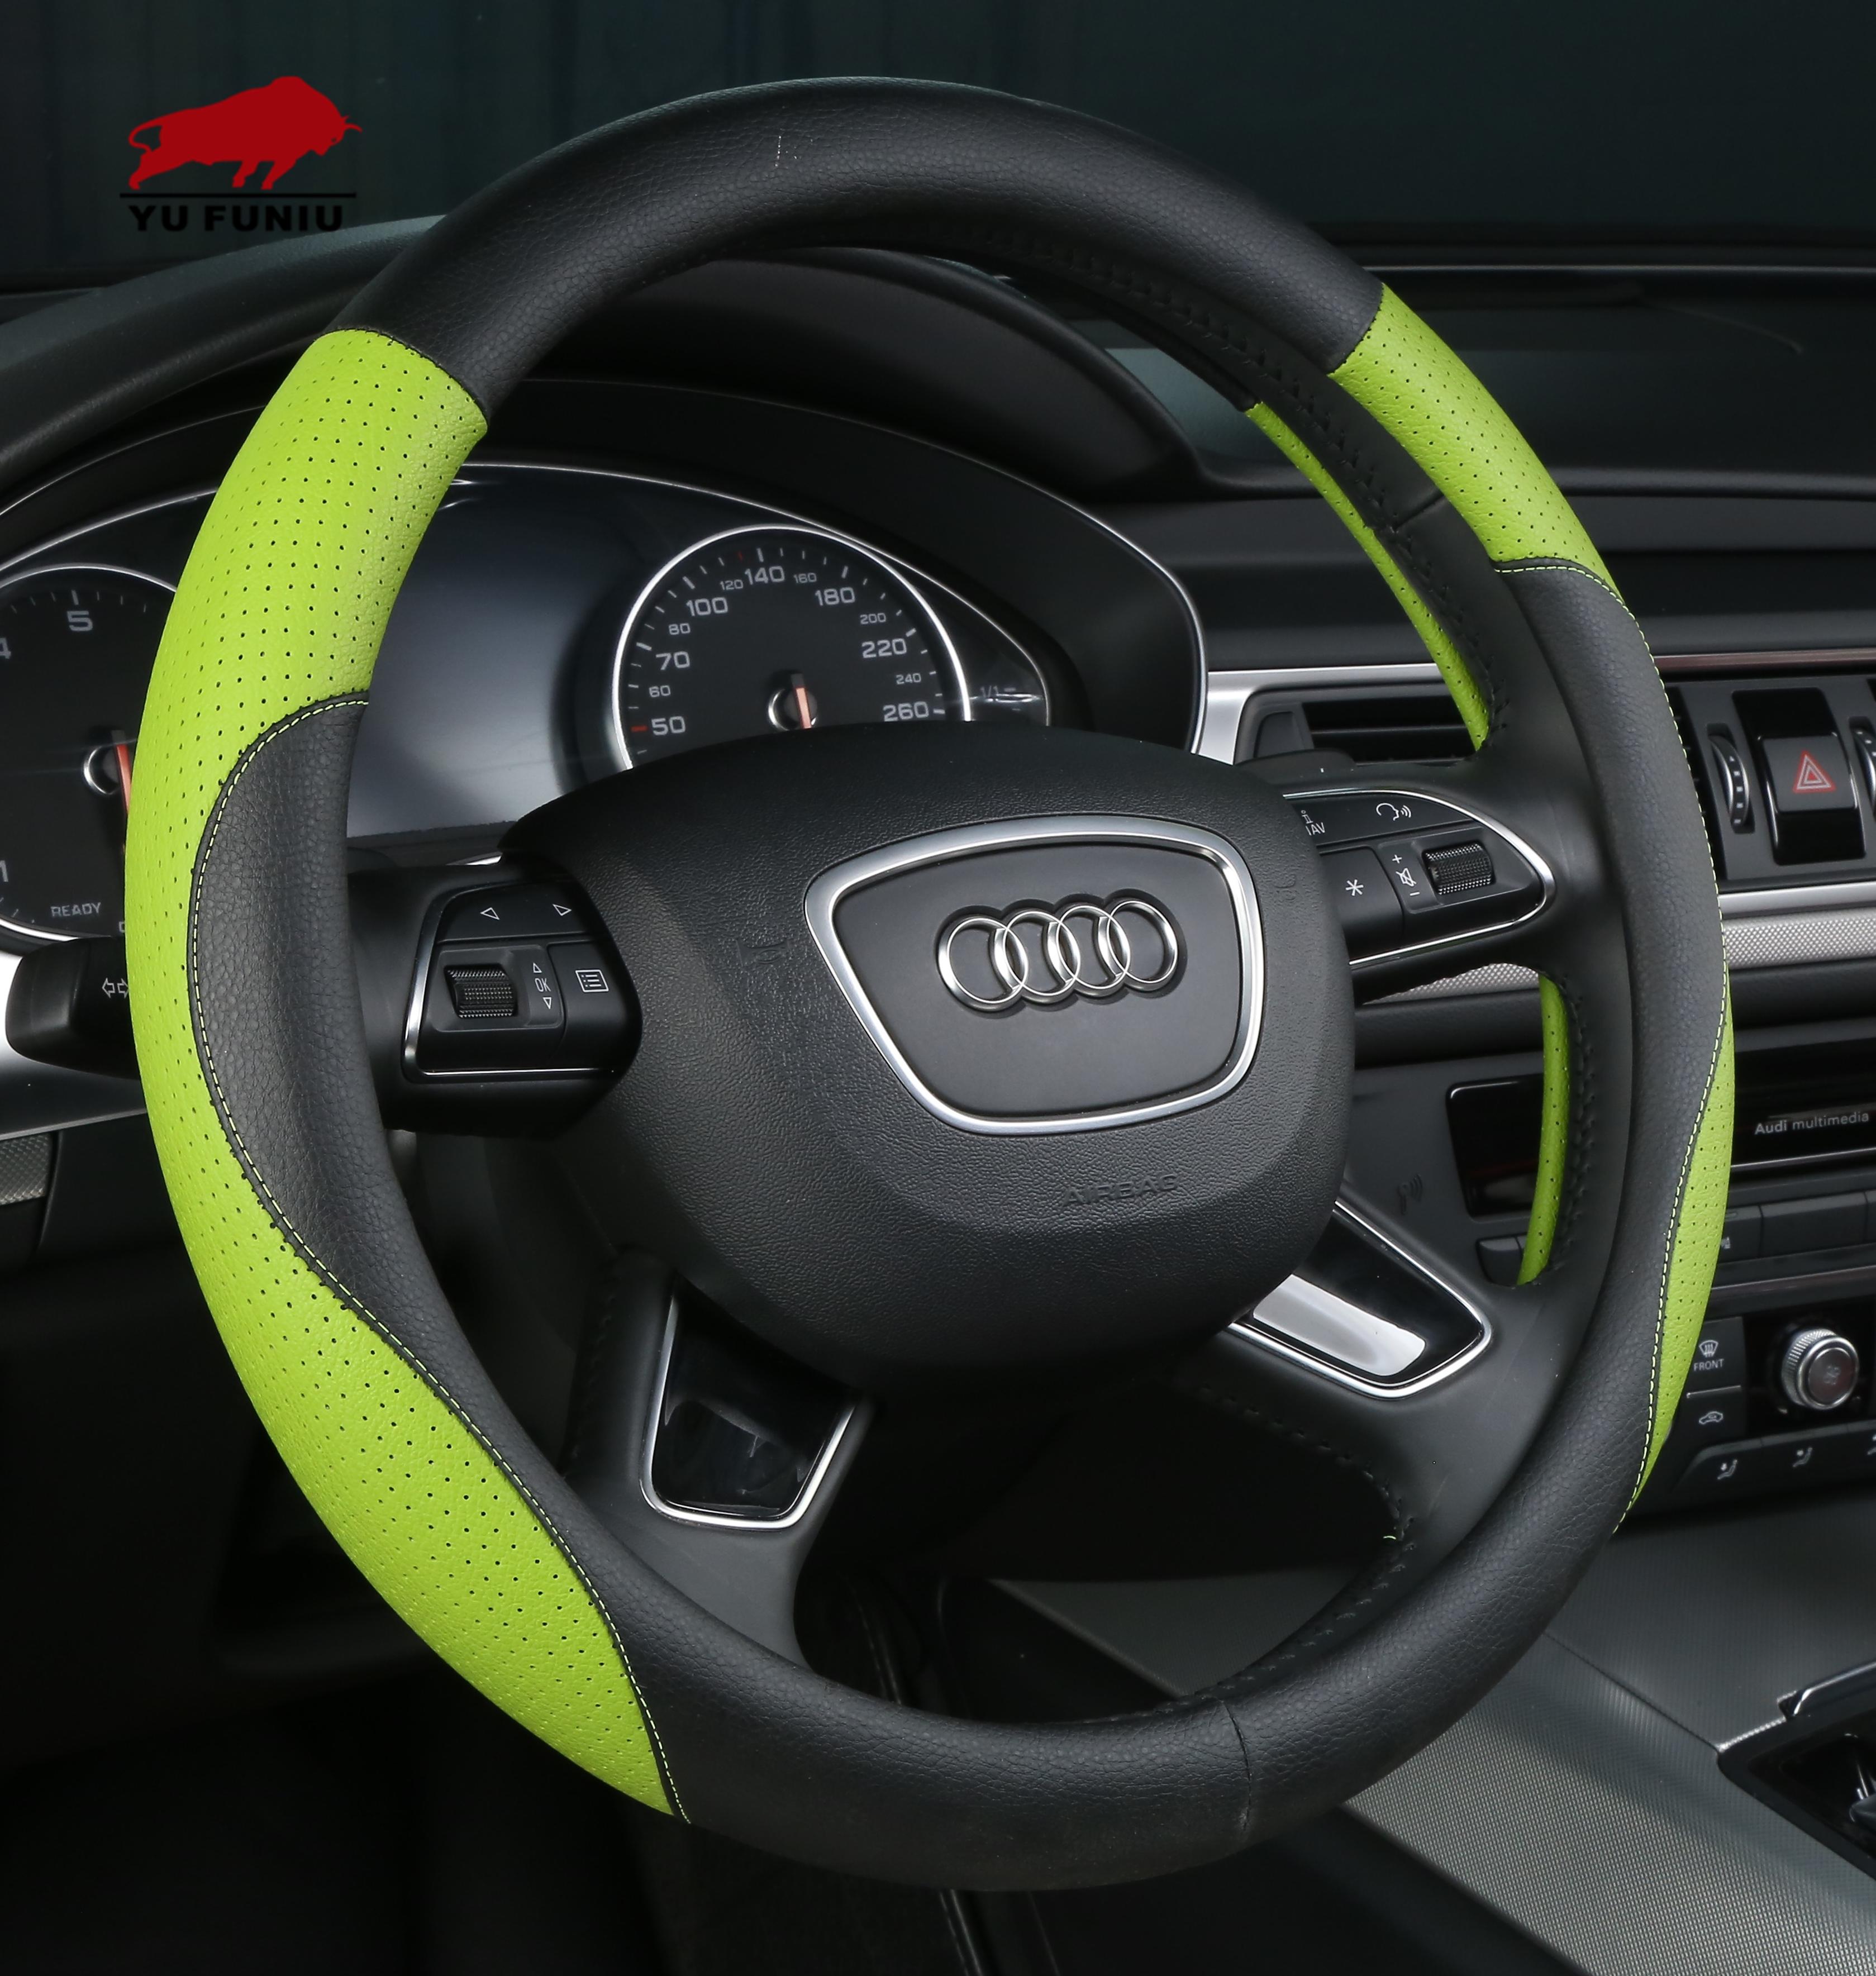 Universal Customized Fashionable Pvc Steering Wheel Cover Buy Plastic Steering Wheel Cover Steering Wheel Cover Made By Pvc Pvc Steering Wheel Cover Product On Alibaba Com